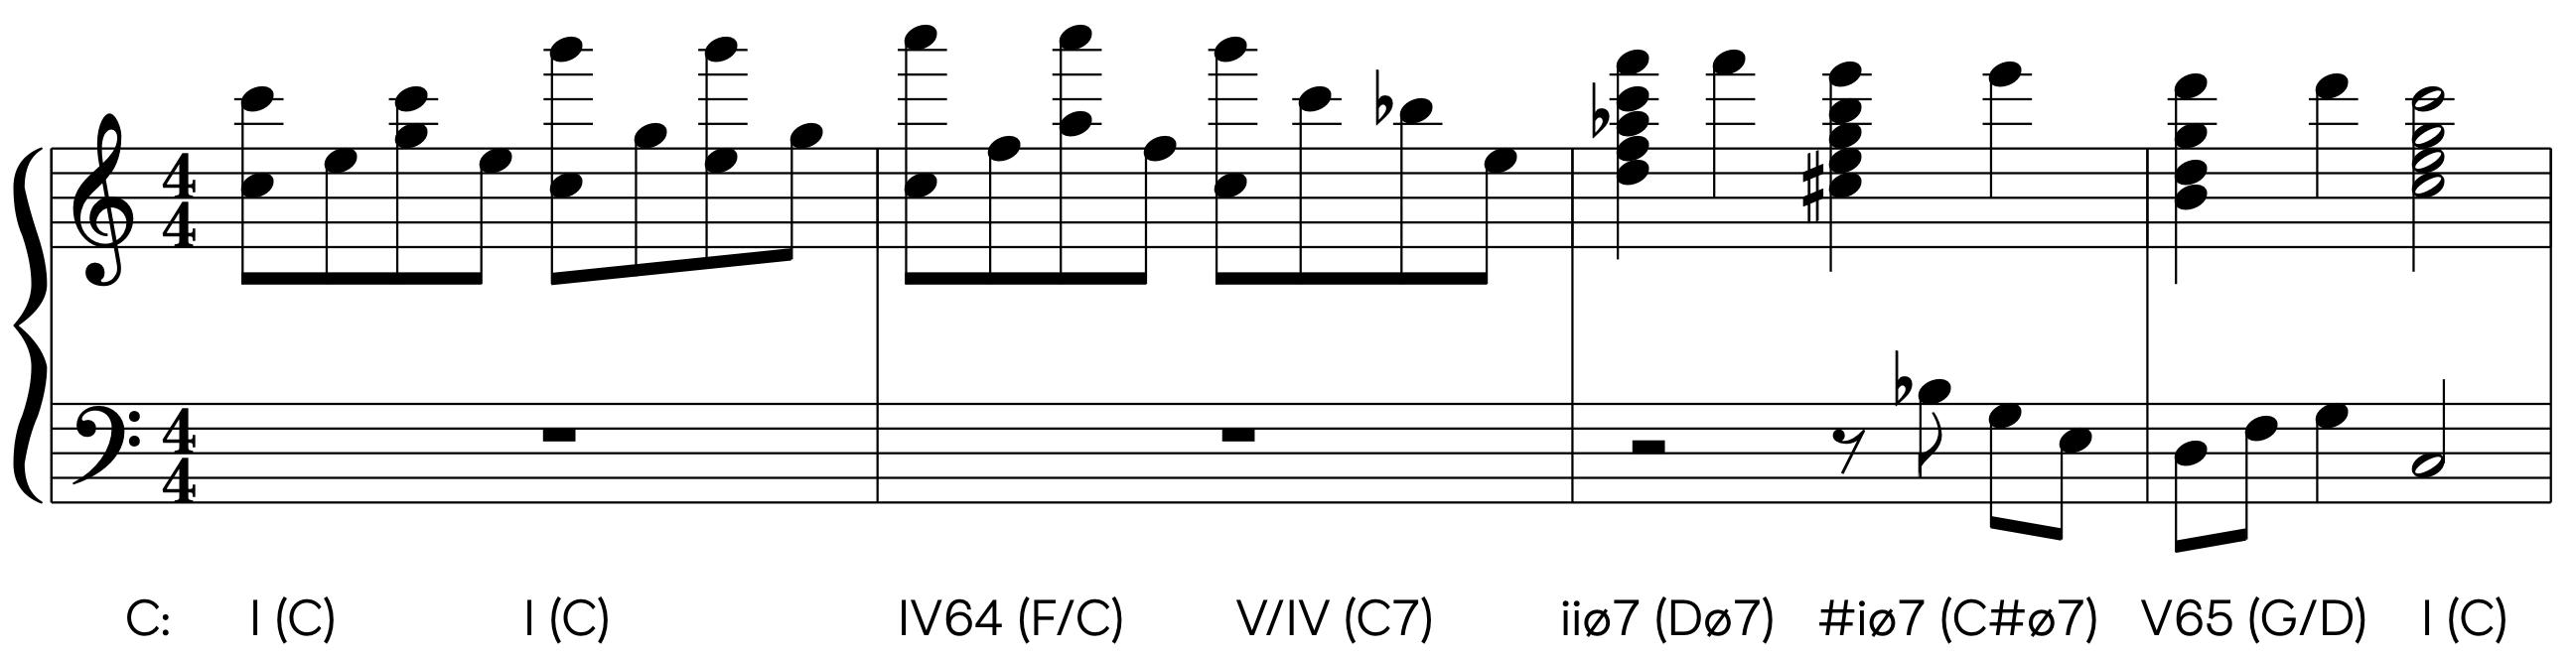 twinkle-twinkle-half-diminished-seventh-harmonization-02